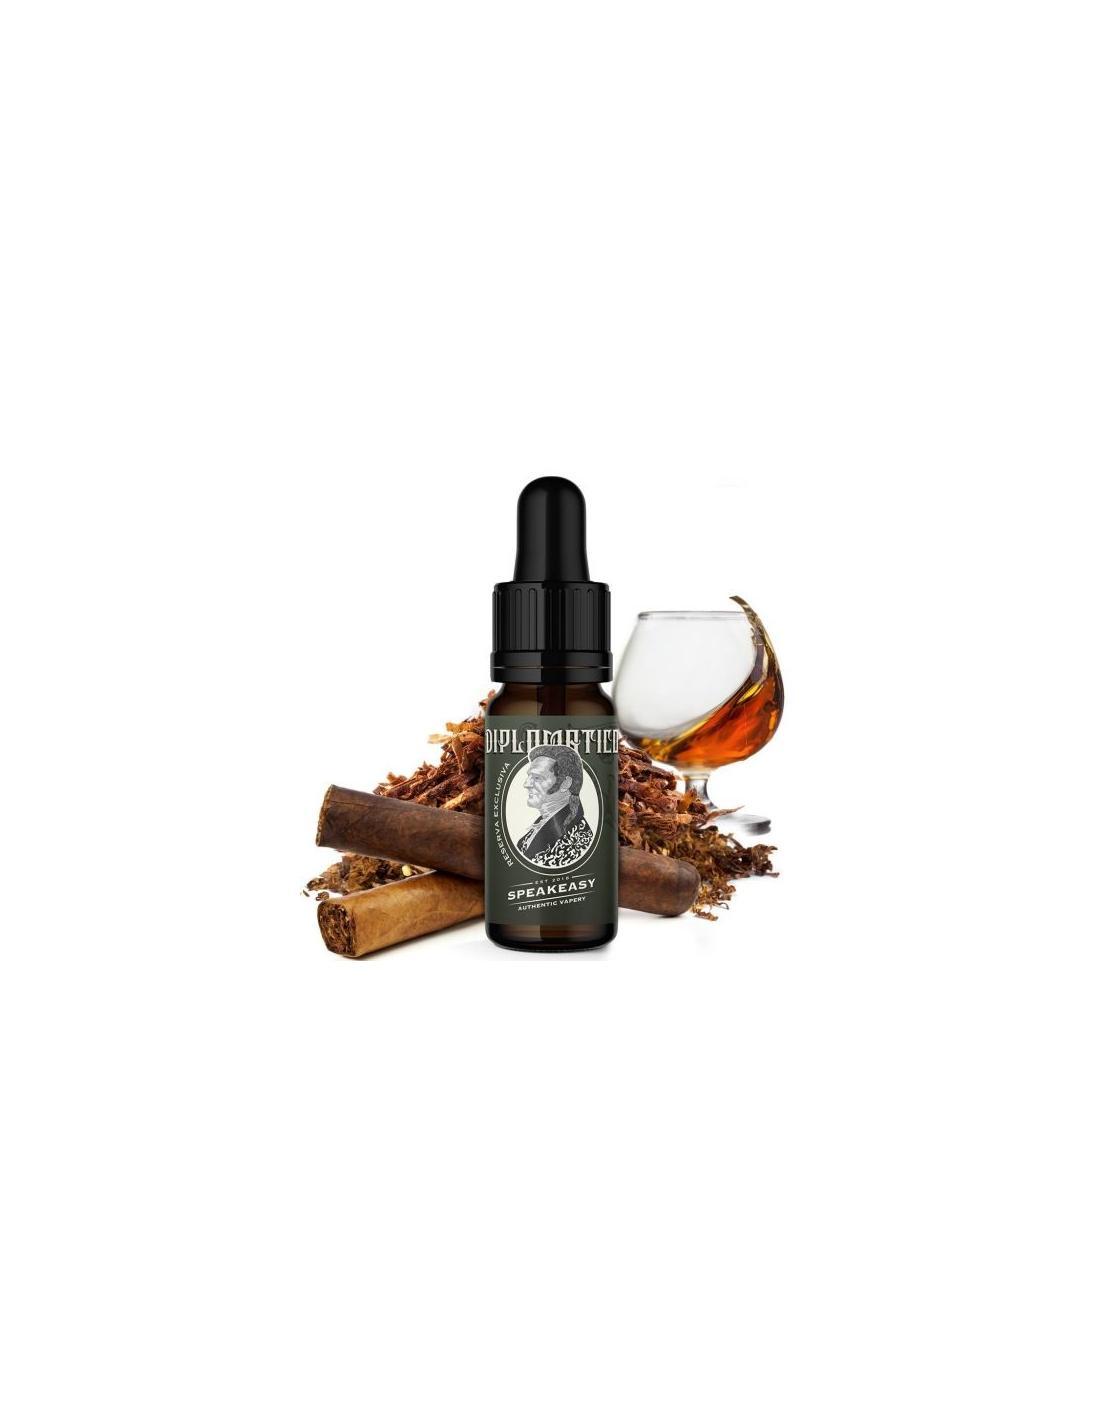 Vaplo Diplomatico Liquido Speakeasy Aroma 10 Ml Tabacco E Rum